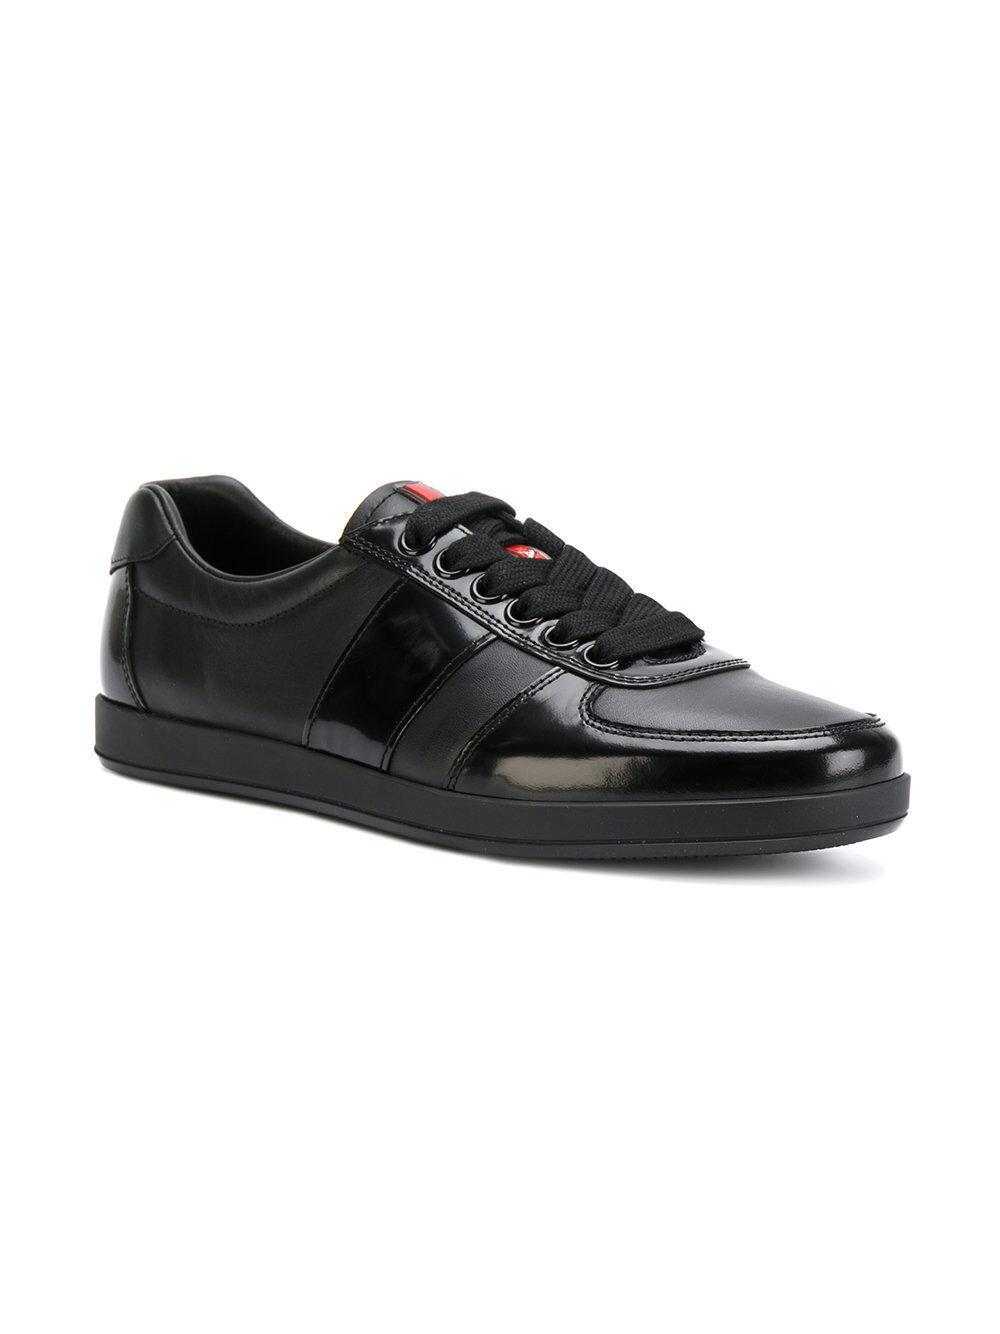 PRADA Scarpe Da Uomo Fashion Scarpe da da da ginnastica МУЖСКАЯ 男鞋 紳士靴 100% Autentico cI8 bb58c4